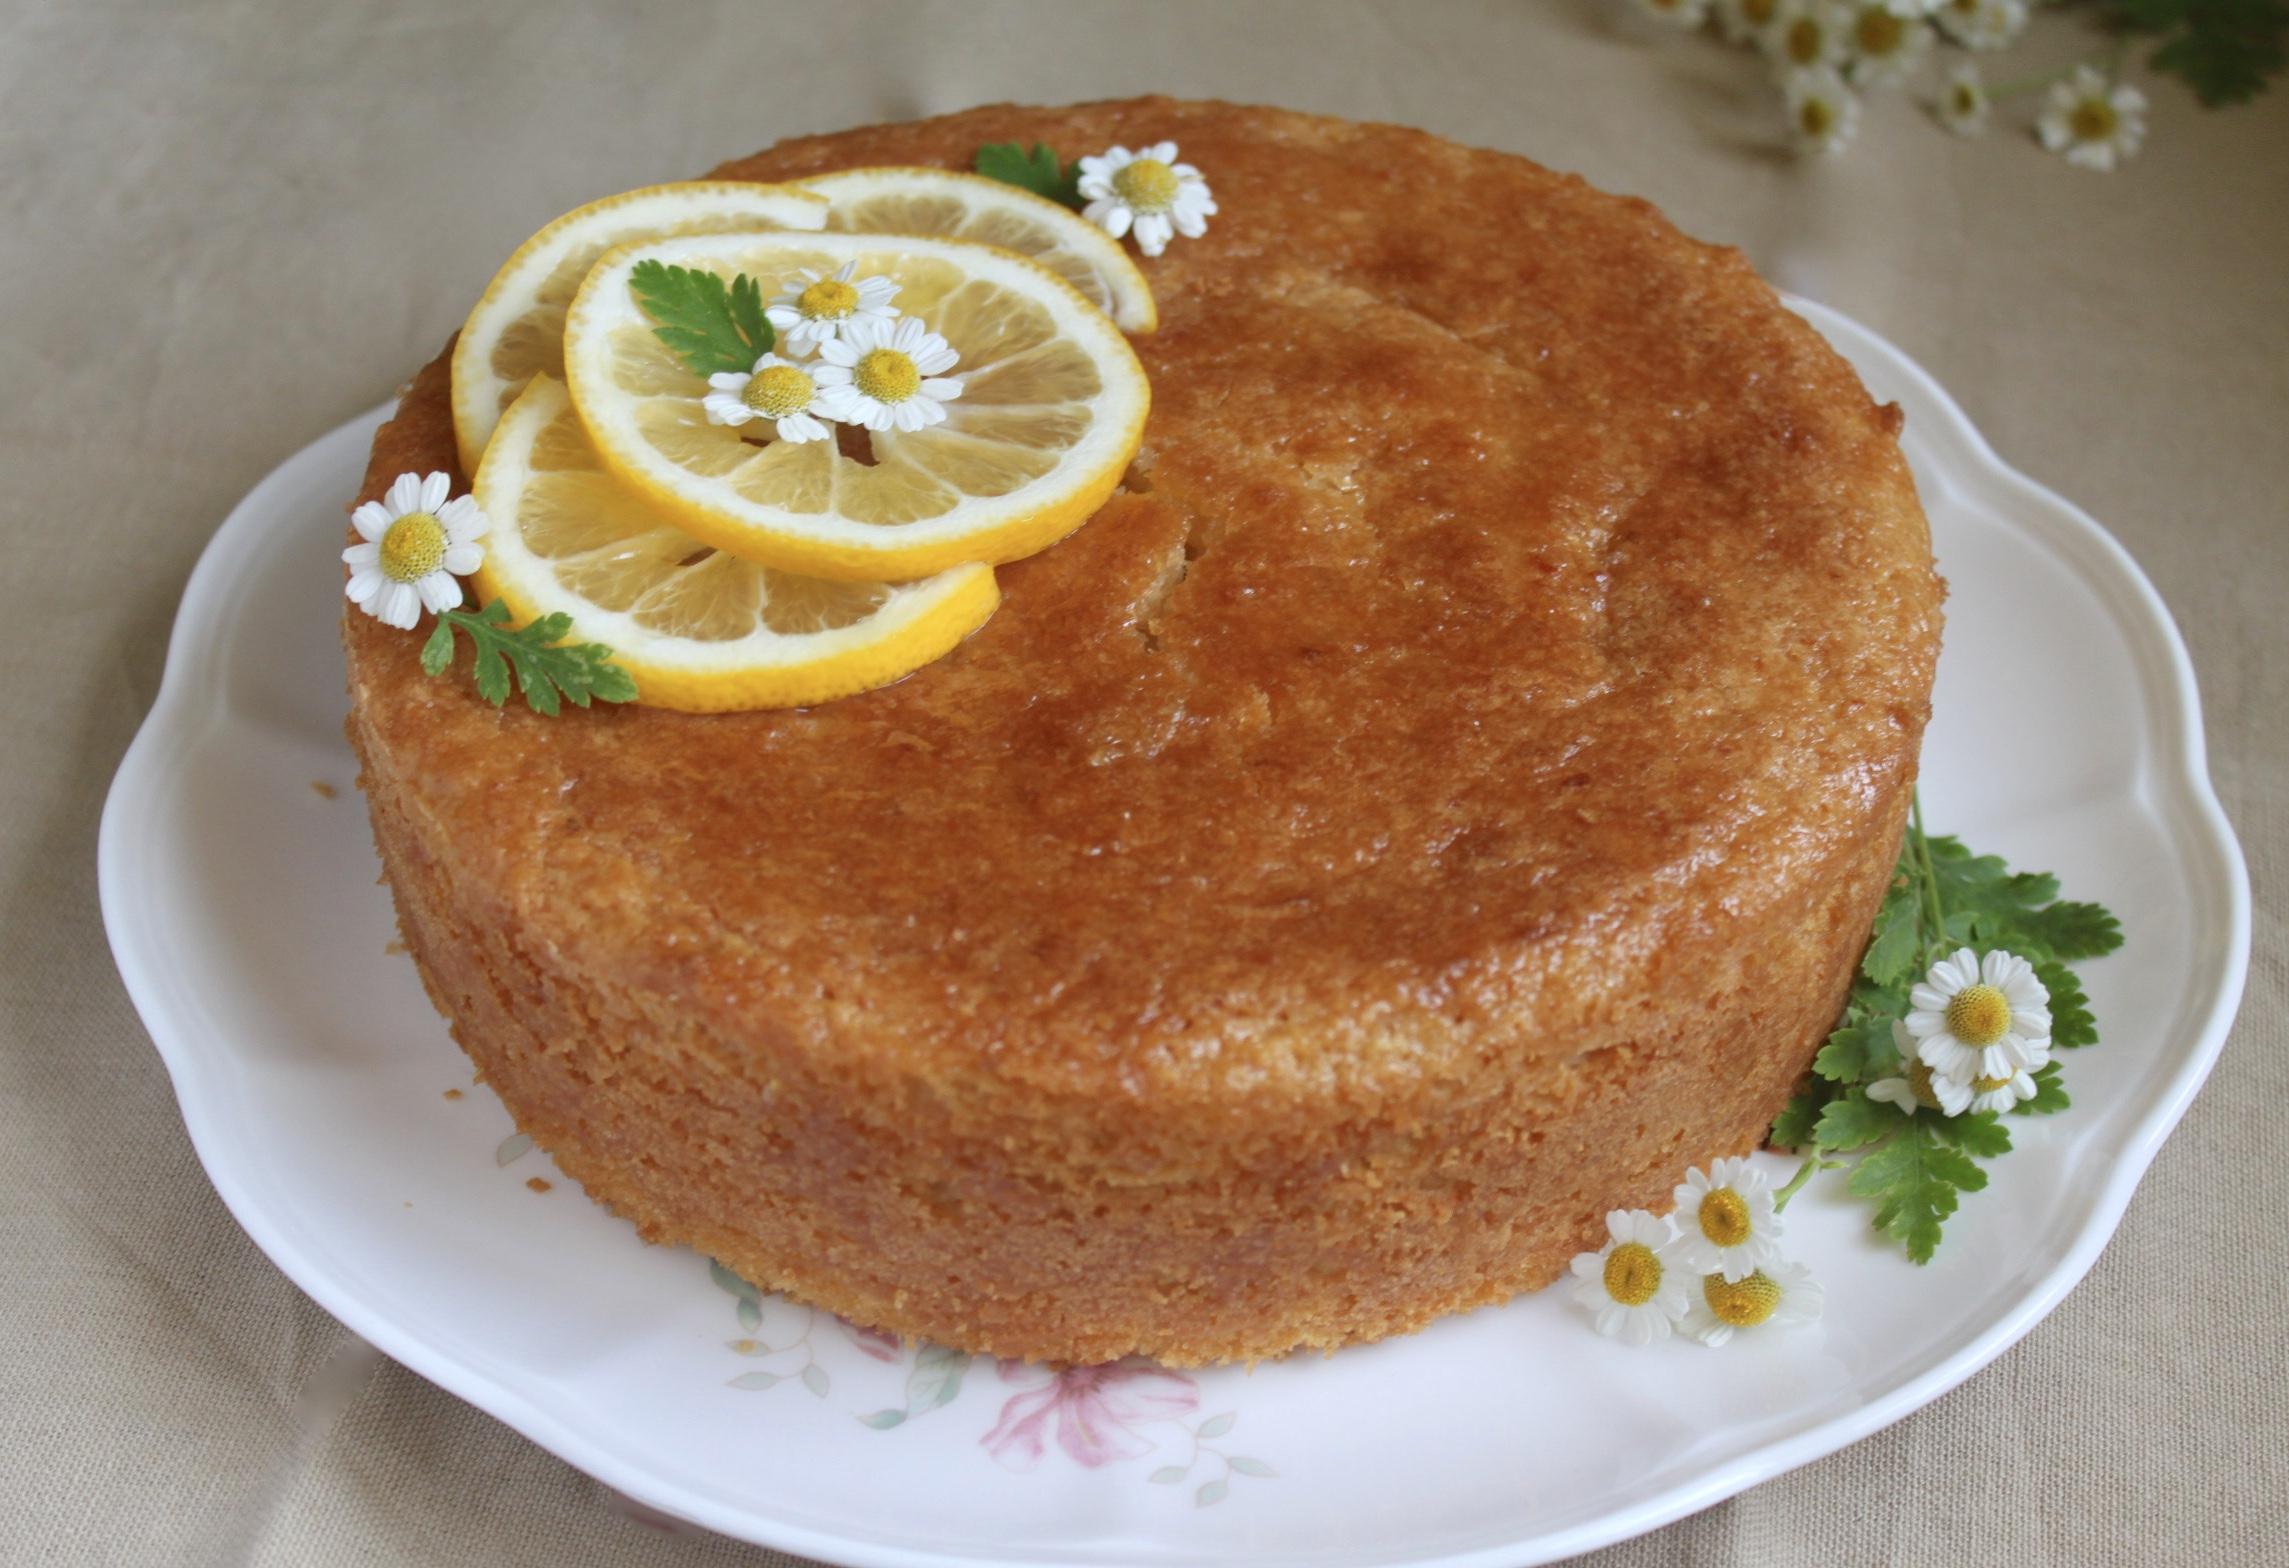 gluten free lemon cake decorated